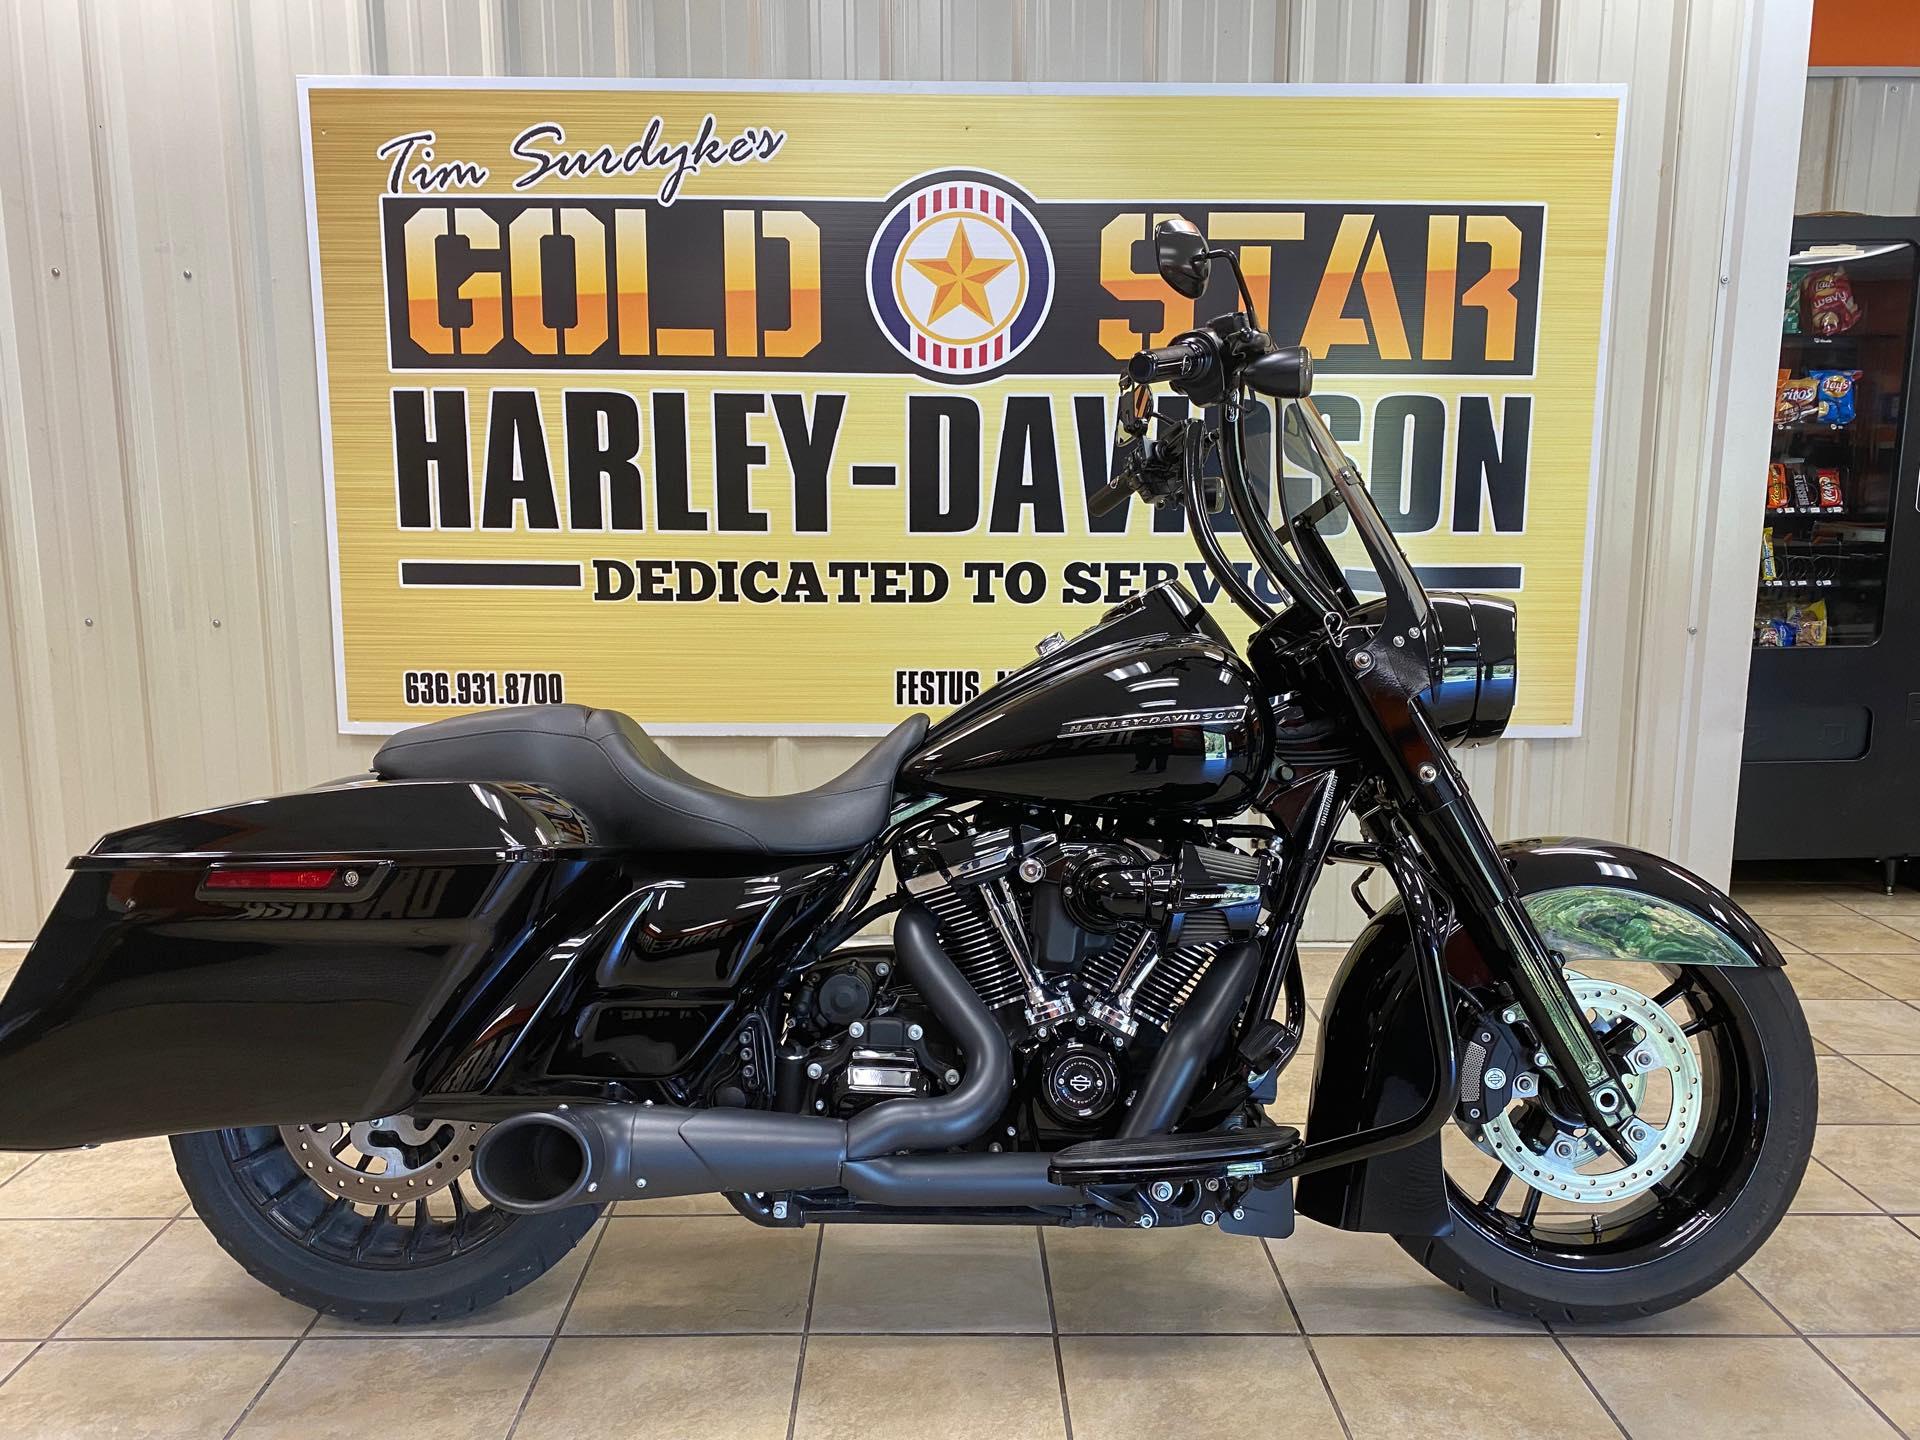 2018 Harley-Davidson Road King Special at Gold Star Harley-Davidson